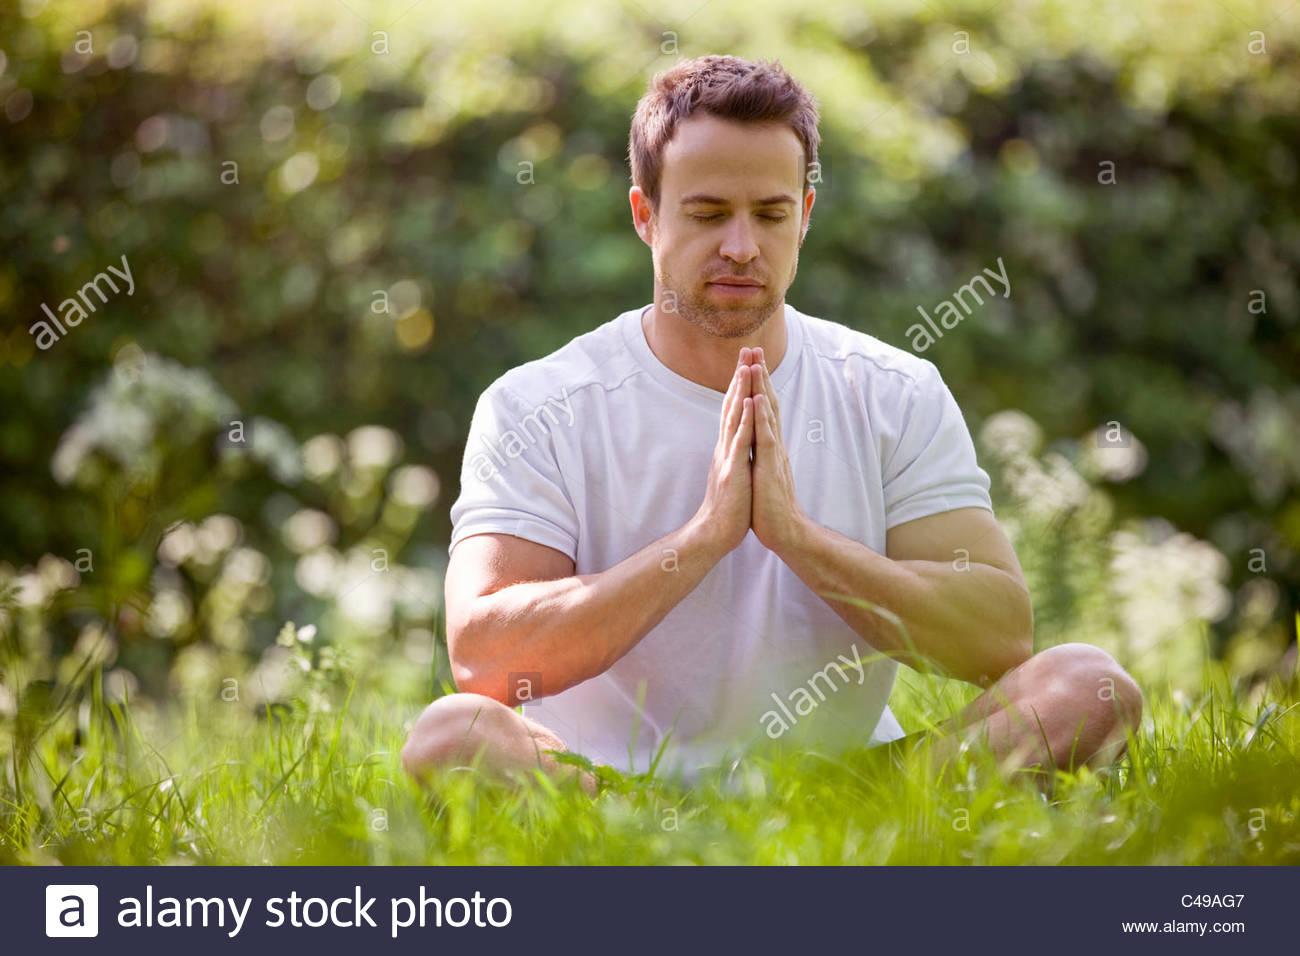 A young man meditating outdoors - Stock Image